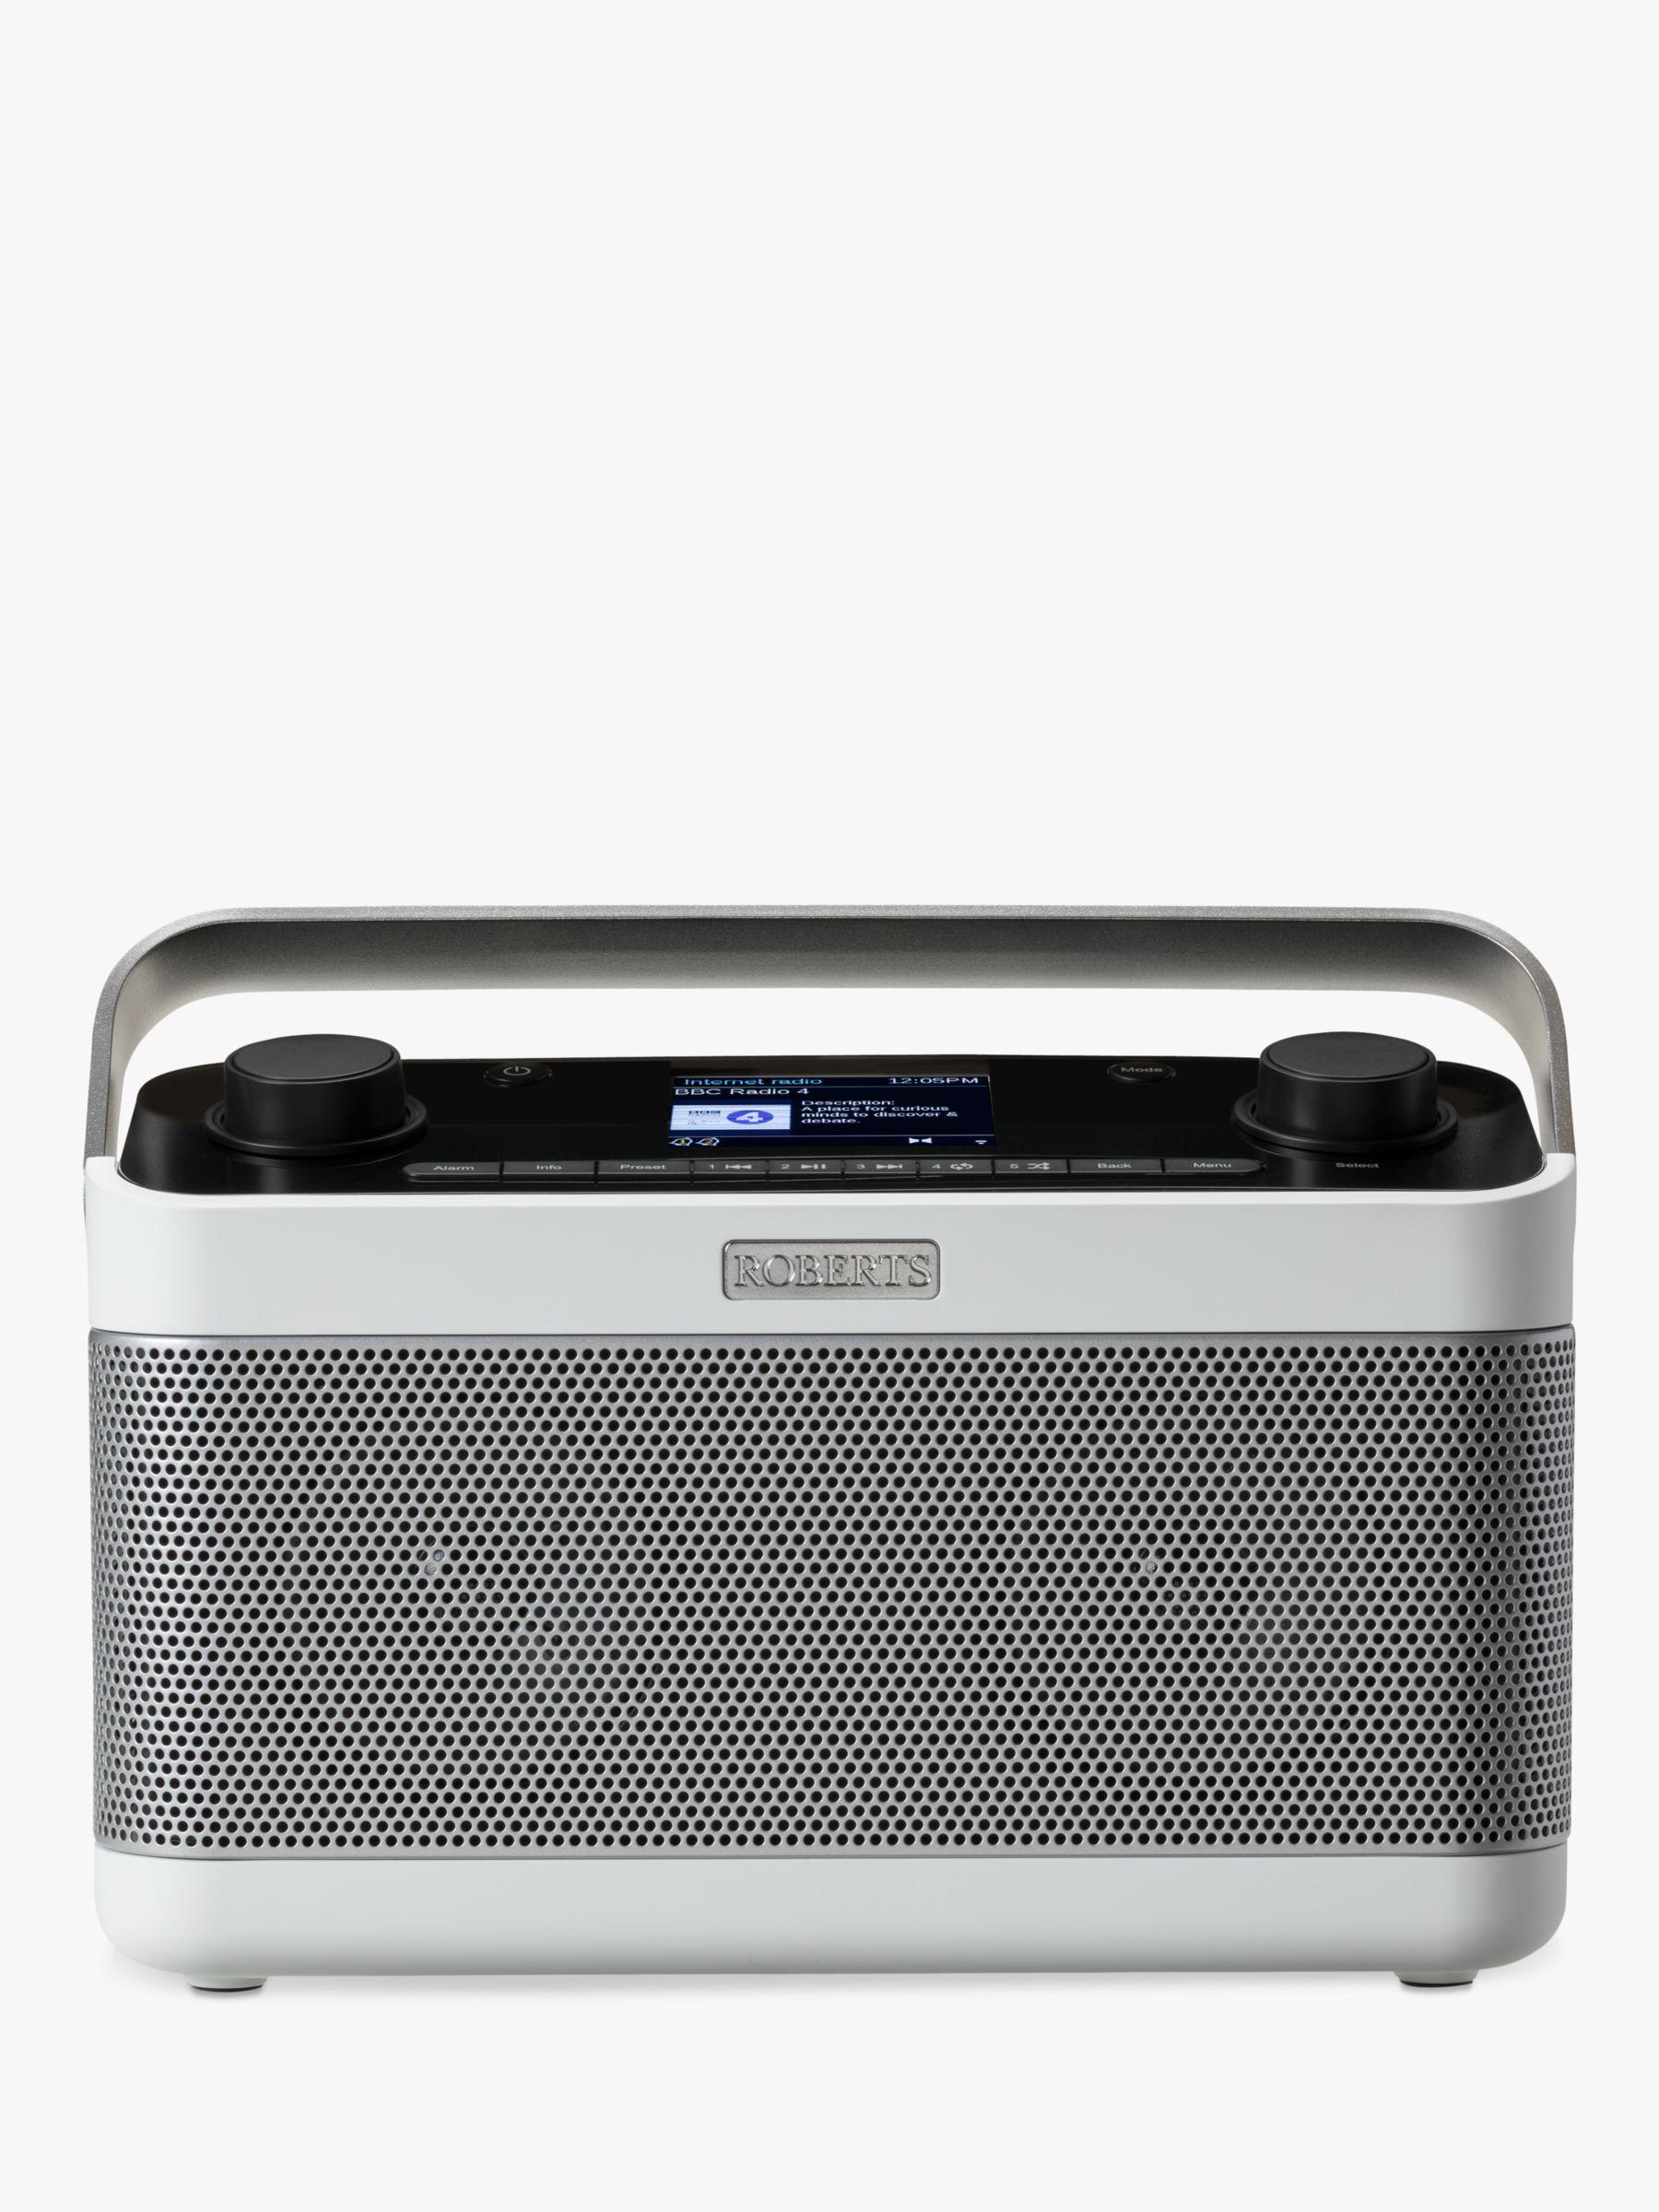 Roberts ROBERTS Stream 218 DAB+/FM/Internet Smart Radio with Bluetooth & Spotify Connect